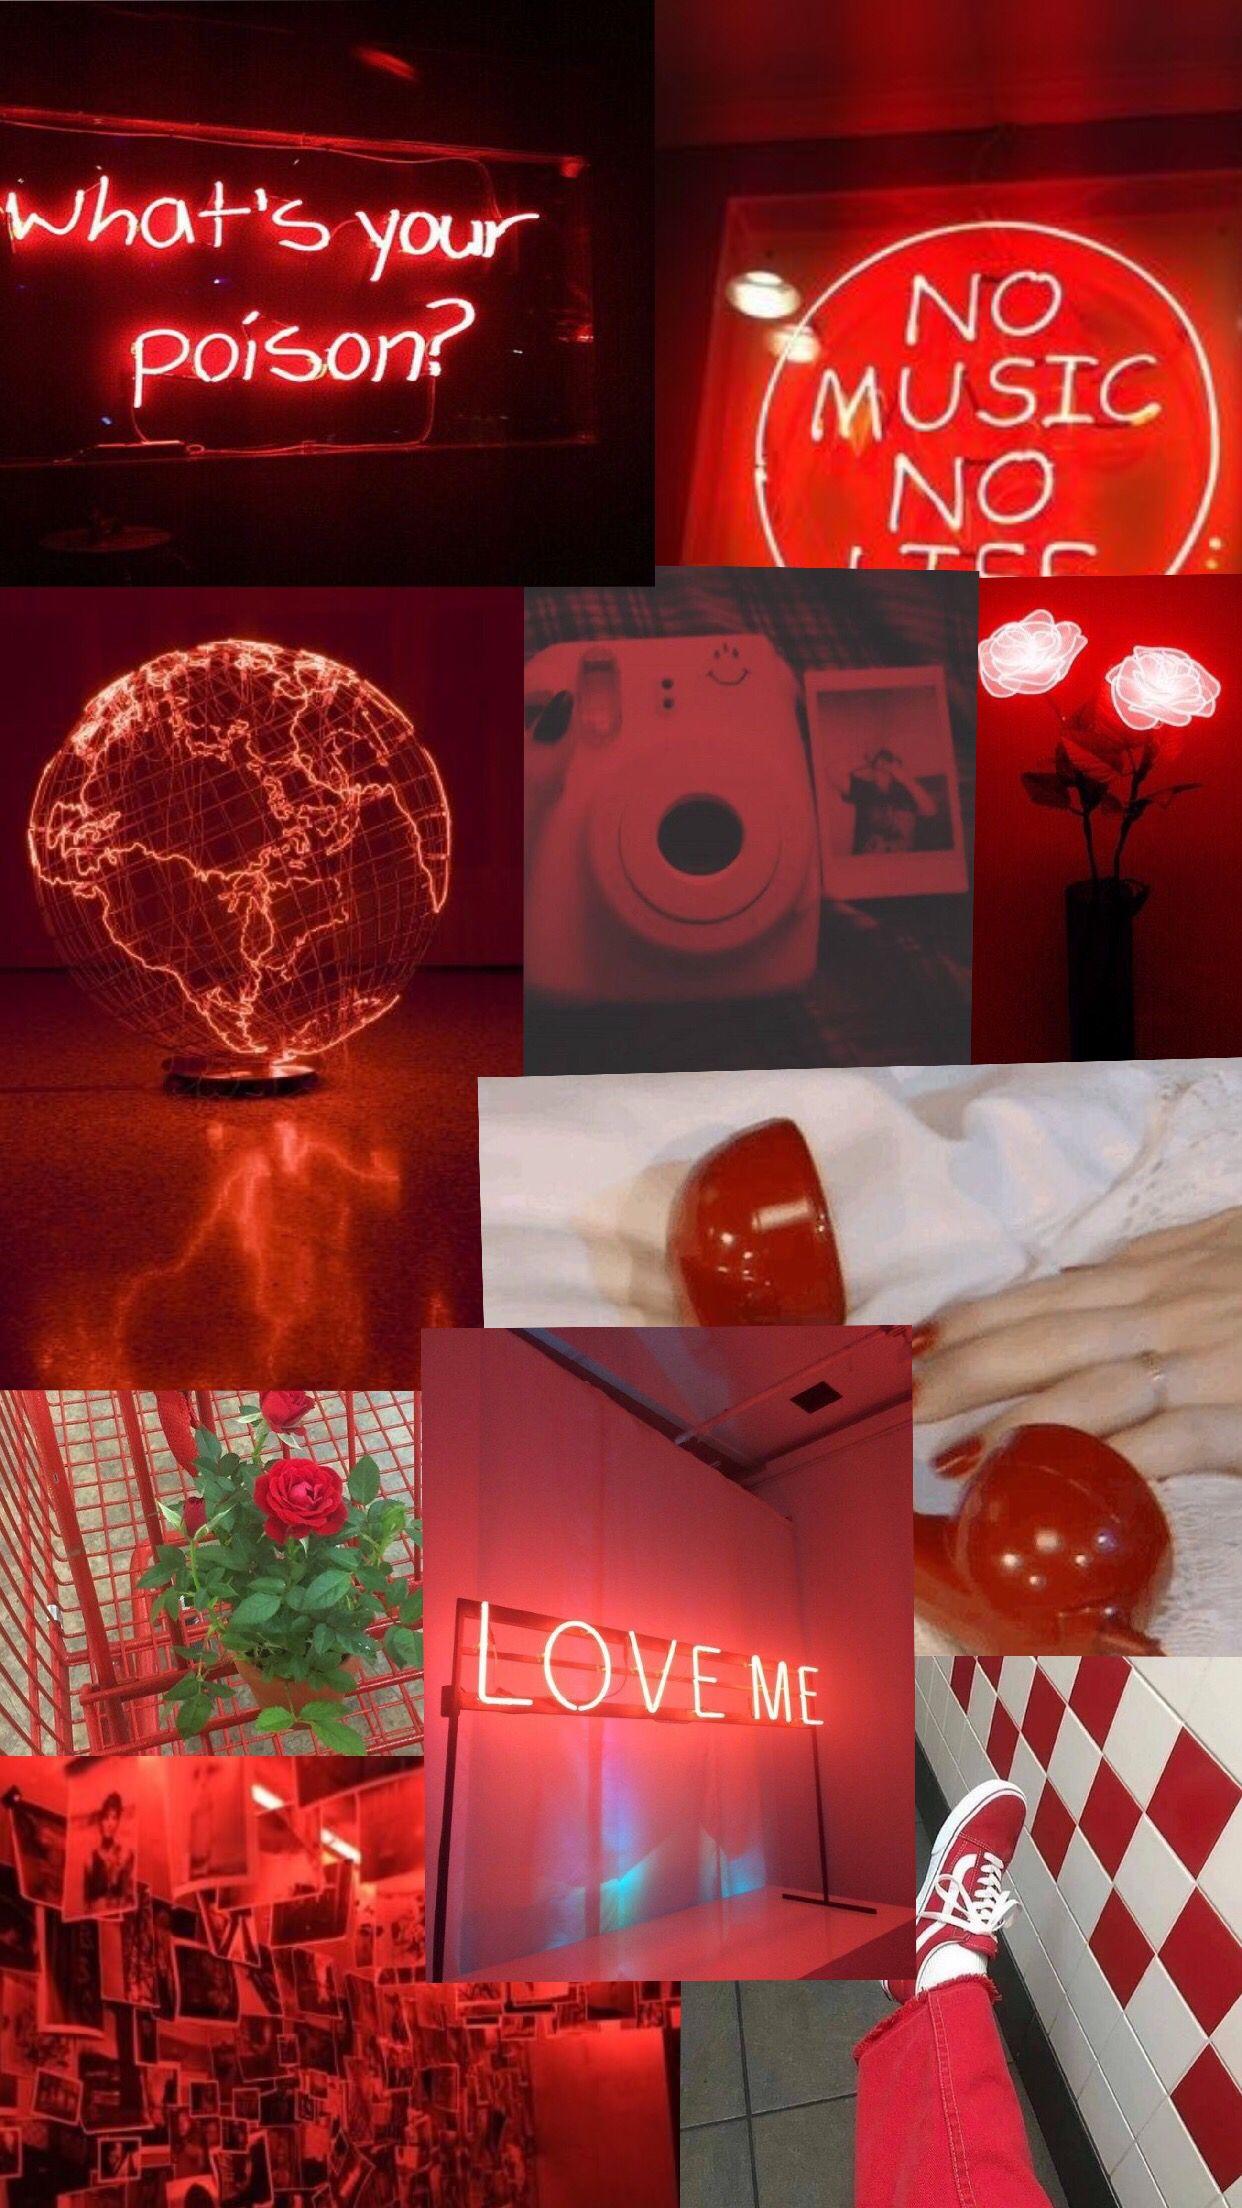 Red Redtumblr Tumblr Aesthetic Desktop Wallpaper Red Aesthetic Aries Aesthetic